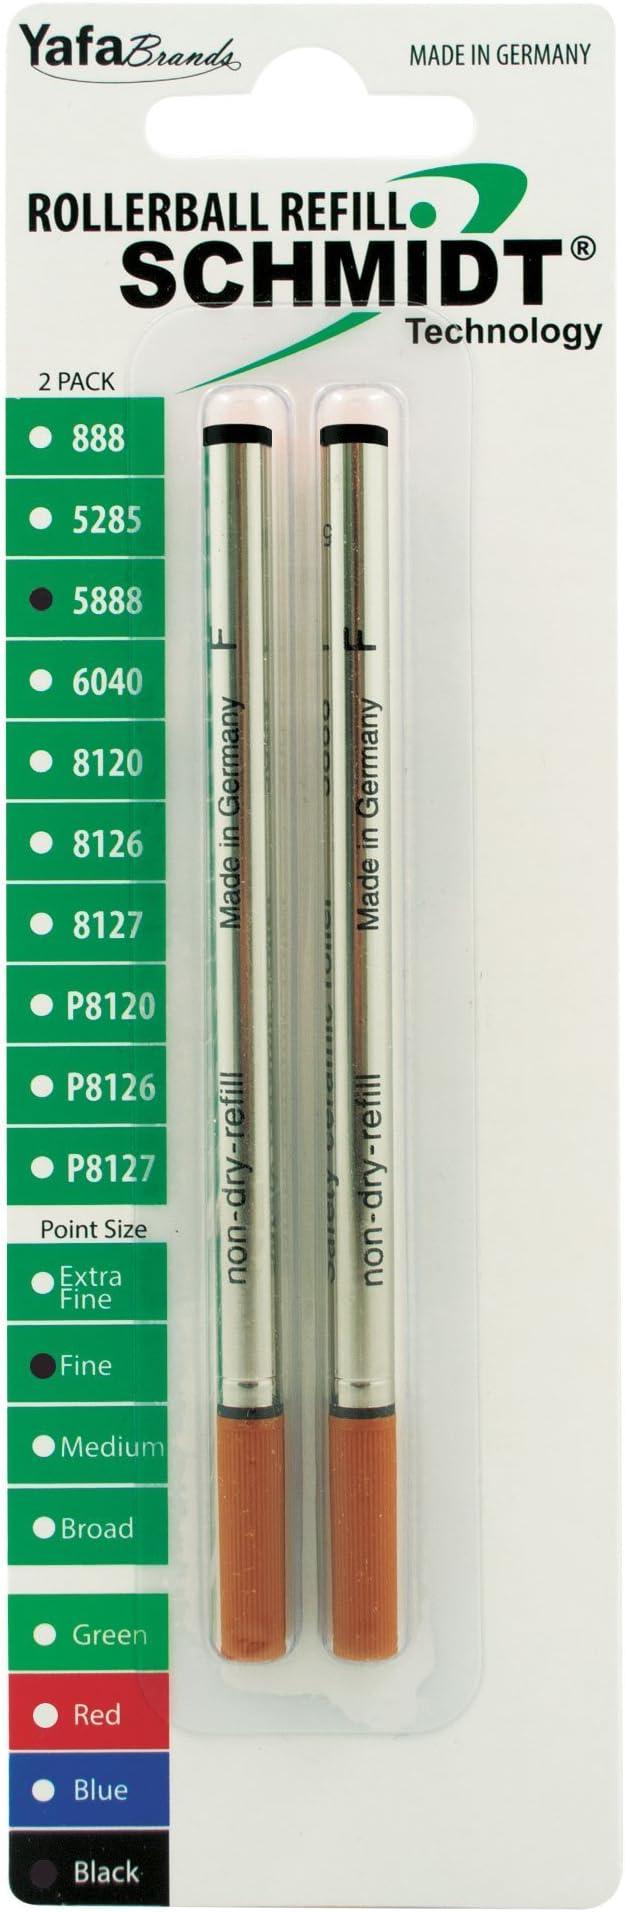 BROAD 6- SCHMIDT NEW- Soft Touch BLACK Roller Ball Refill 1.0 5888